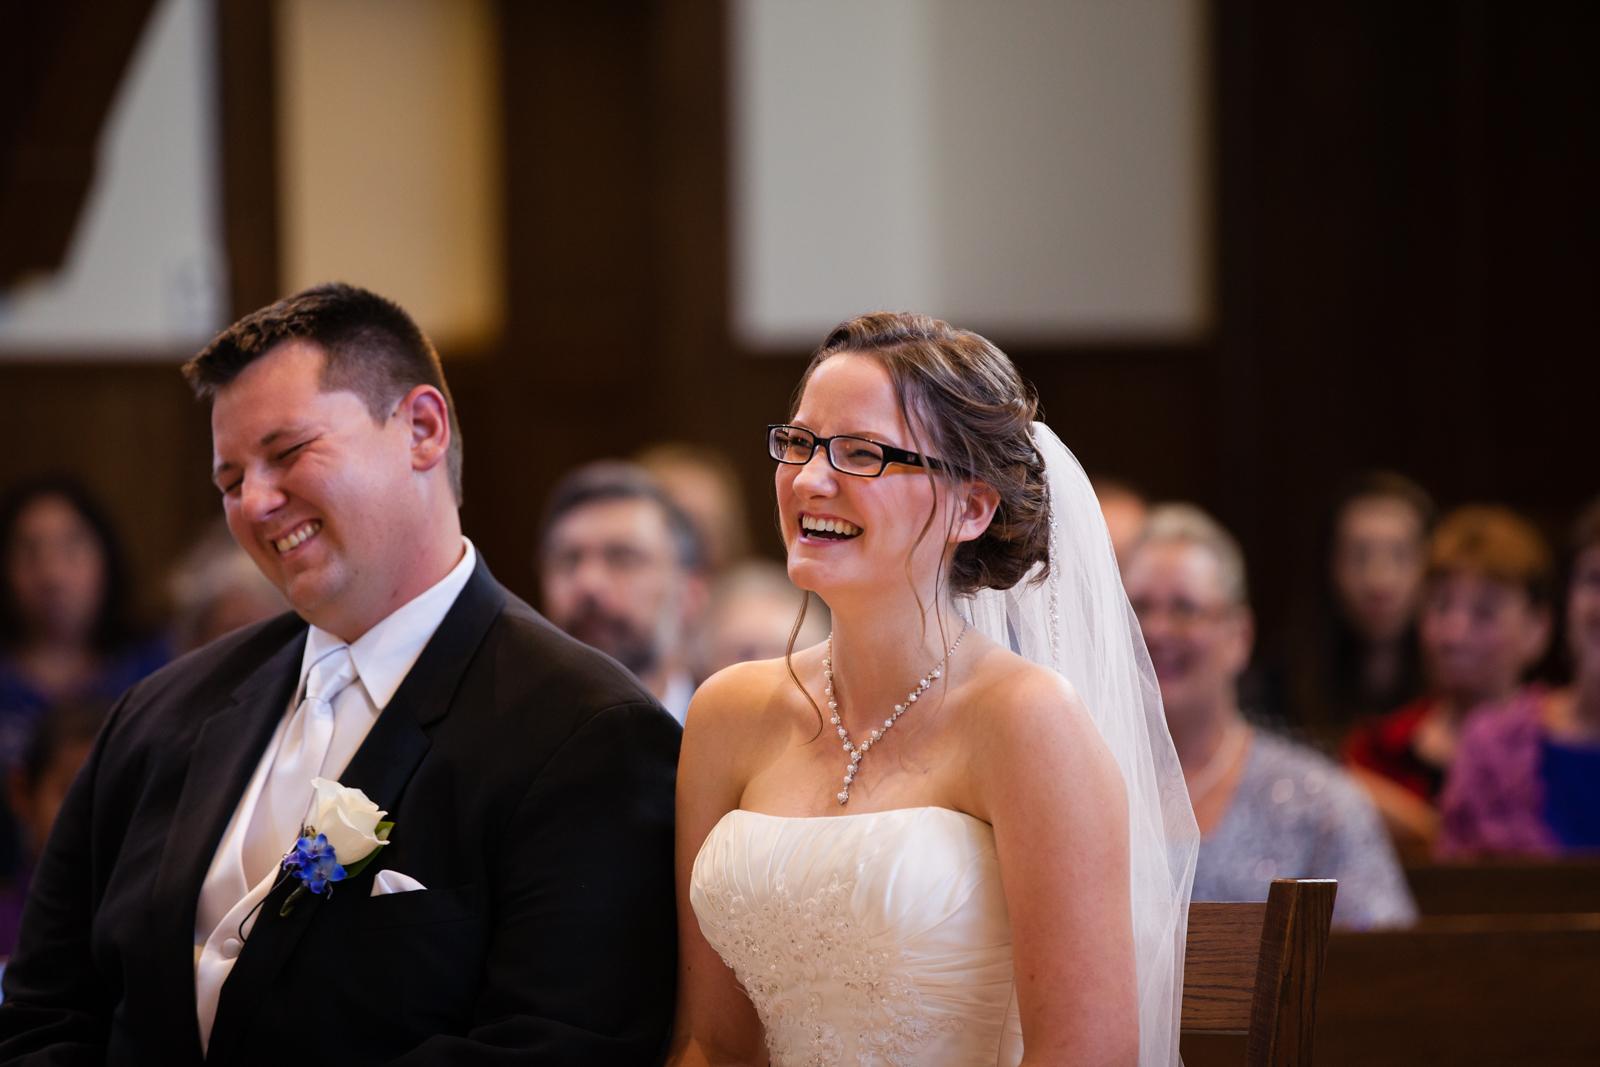 Eastons-Beach-Rotunda-Ballroom-Wedding-Newport-Rhode-Island-PhotographybyAmandaMorgan-34.jpg